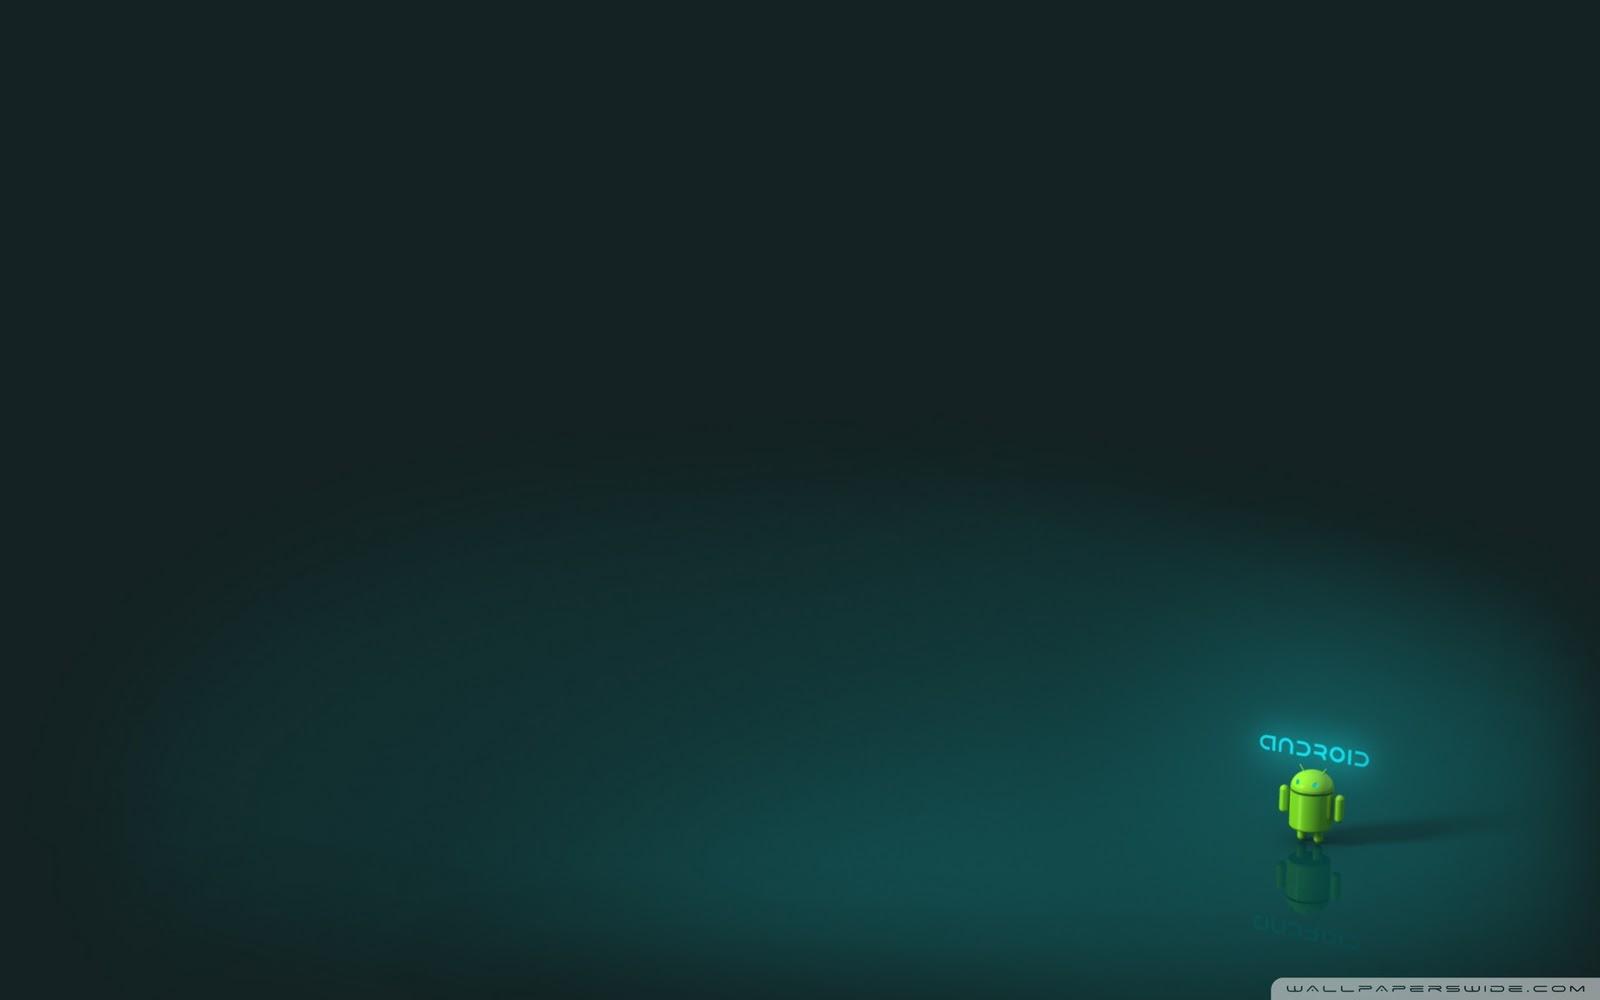 http://4.bp.blogspot.com/-IPCi3FzATo8/Tnw-e1Dj1jI/AAAAAAAAA1U/AUsC2MGRzd4/s1600/android-wallpaper-1920x1200.jpg